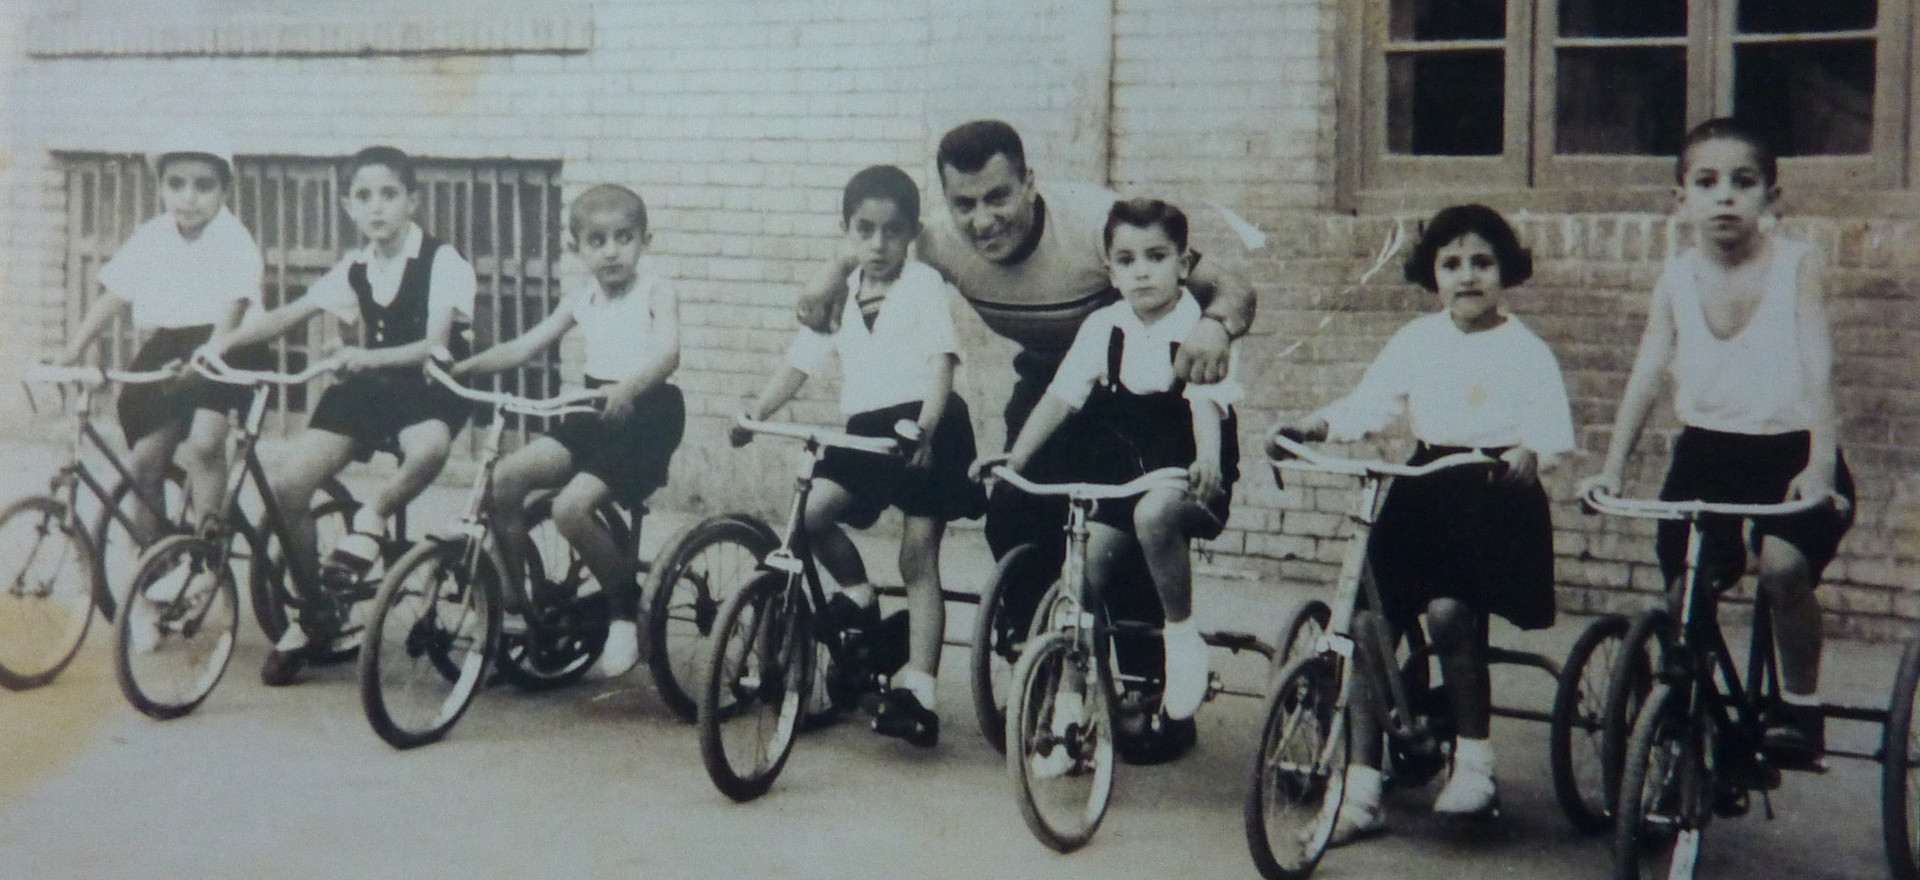 Iraj Elghanian: Tehran 1953